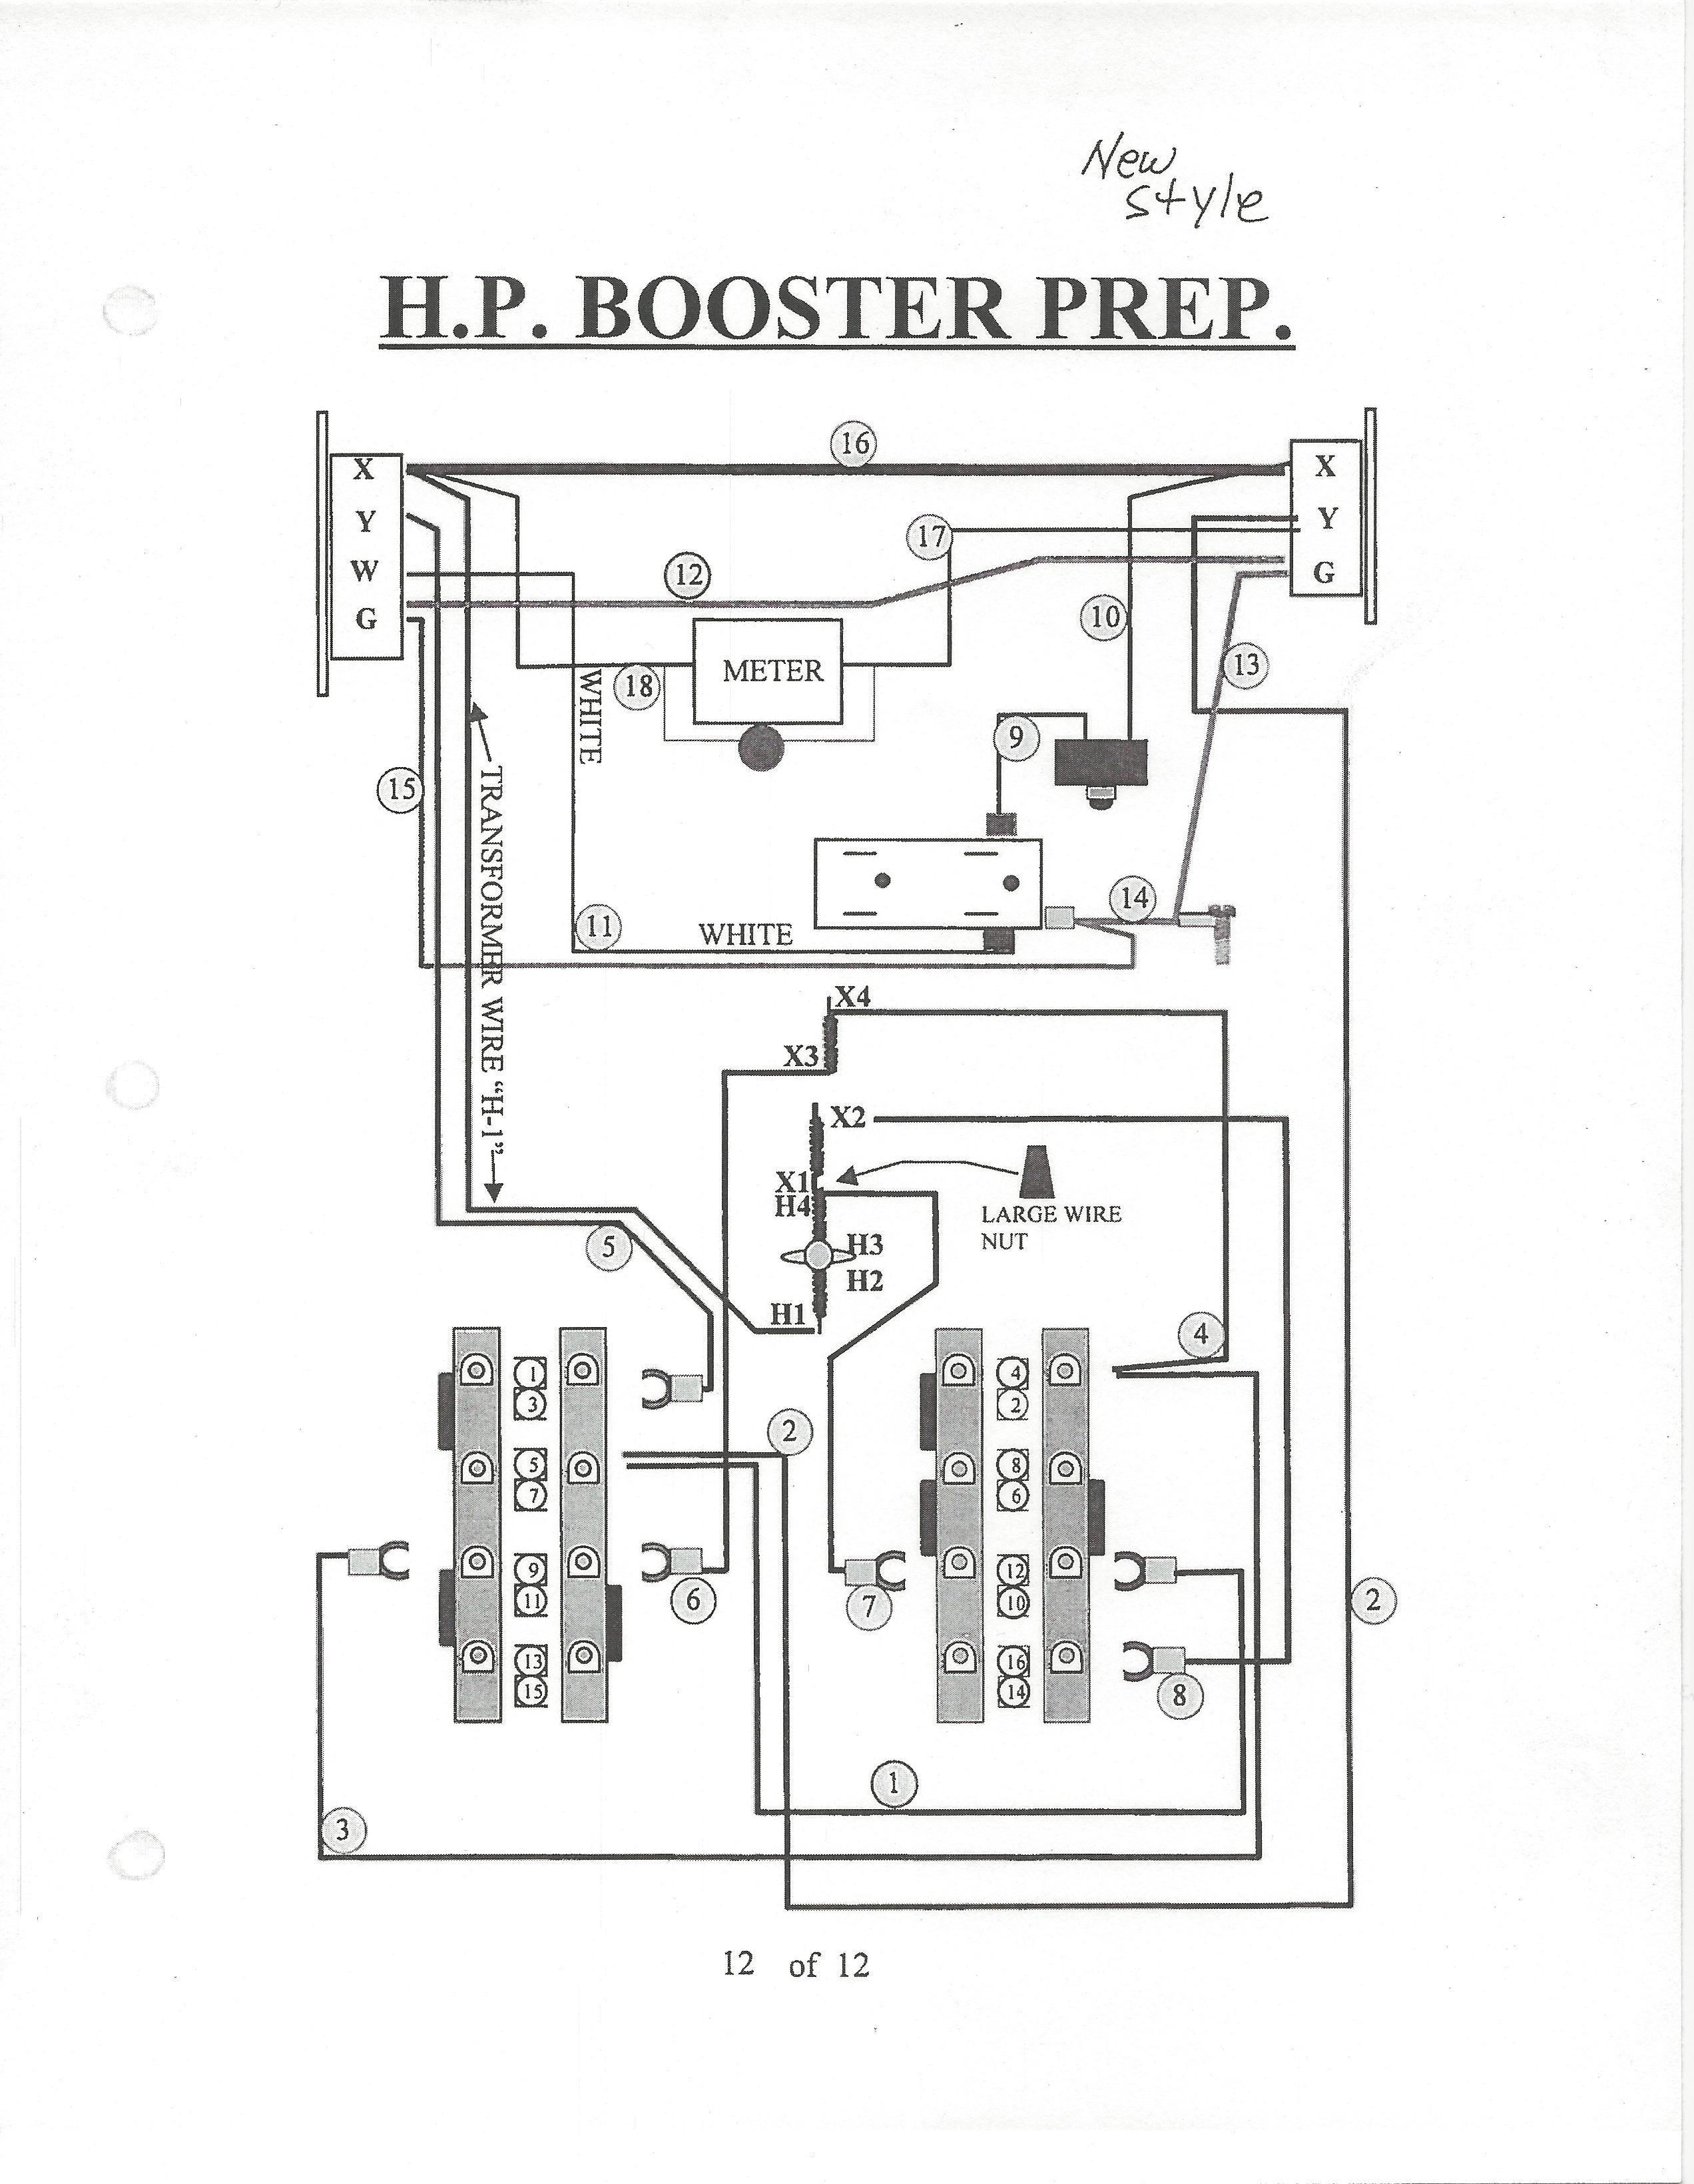 sinpac switch wiring diagram Collection-s ussander shop for floor sanding machines parts rh store ussander SINPAC Switch Manual Baldor Motor Capacitor Wiring Diagram 15-t